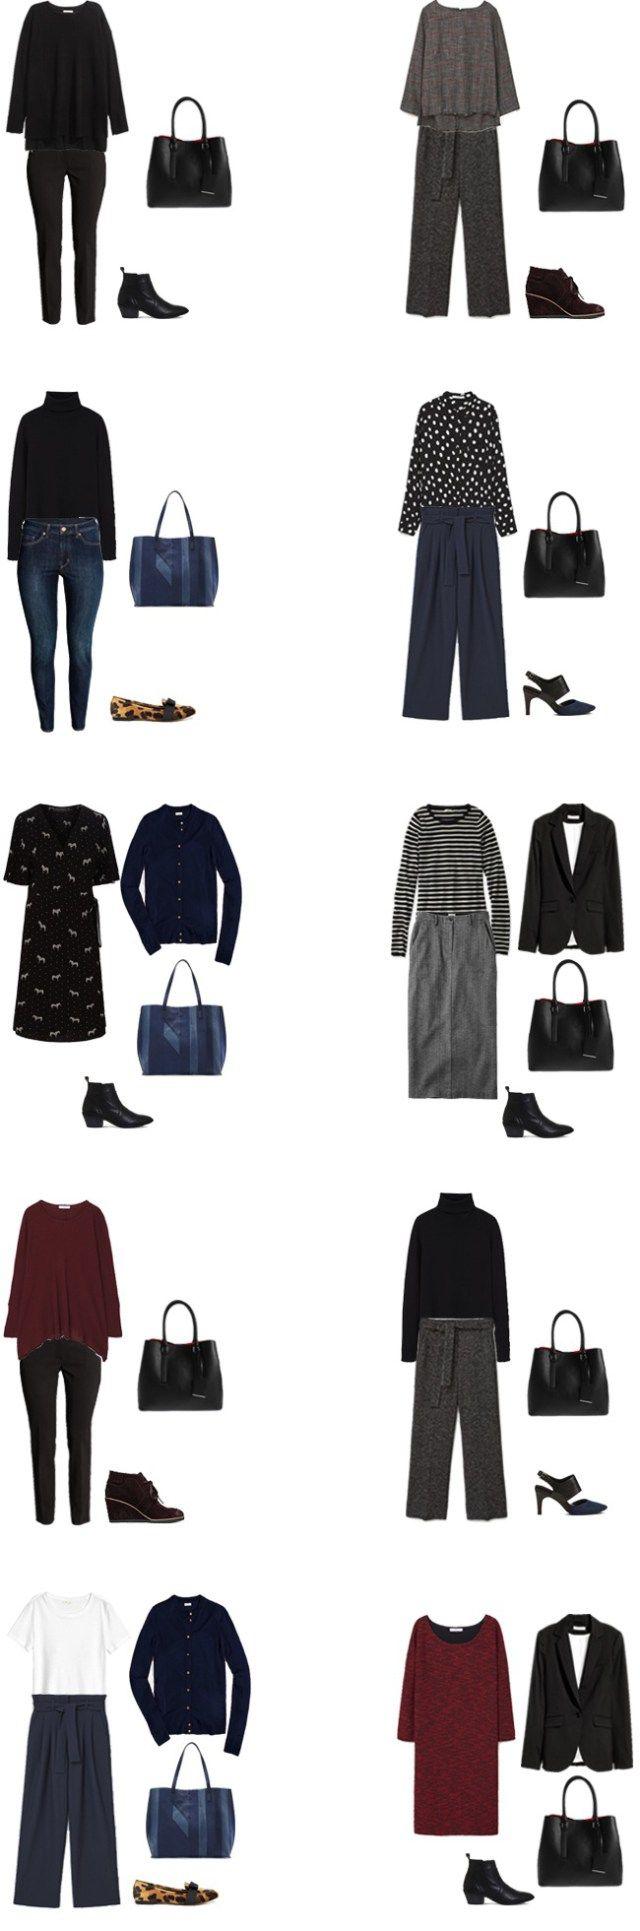 Fall 2016/Winter 2017 Work Capsule Wardrobe Outfit Options 2- livelovesara